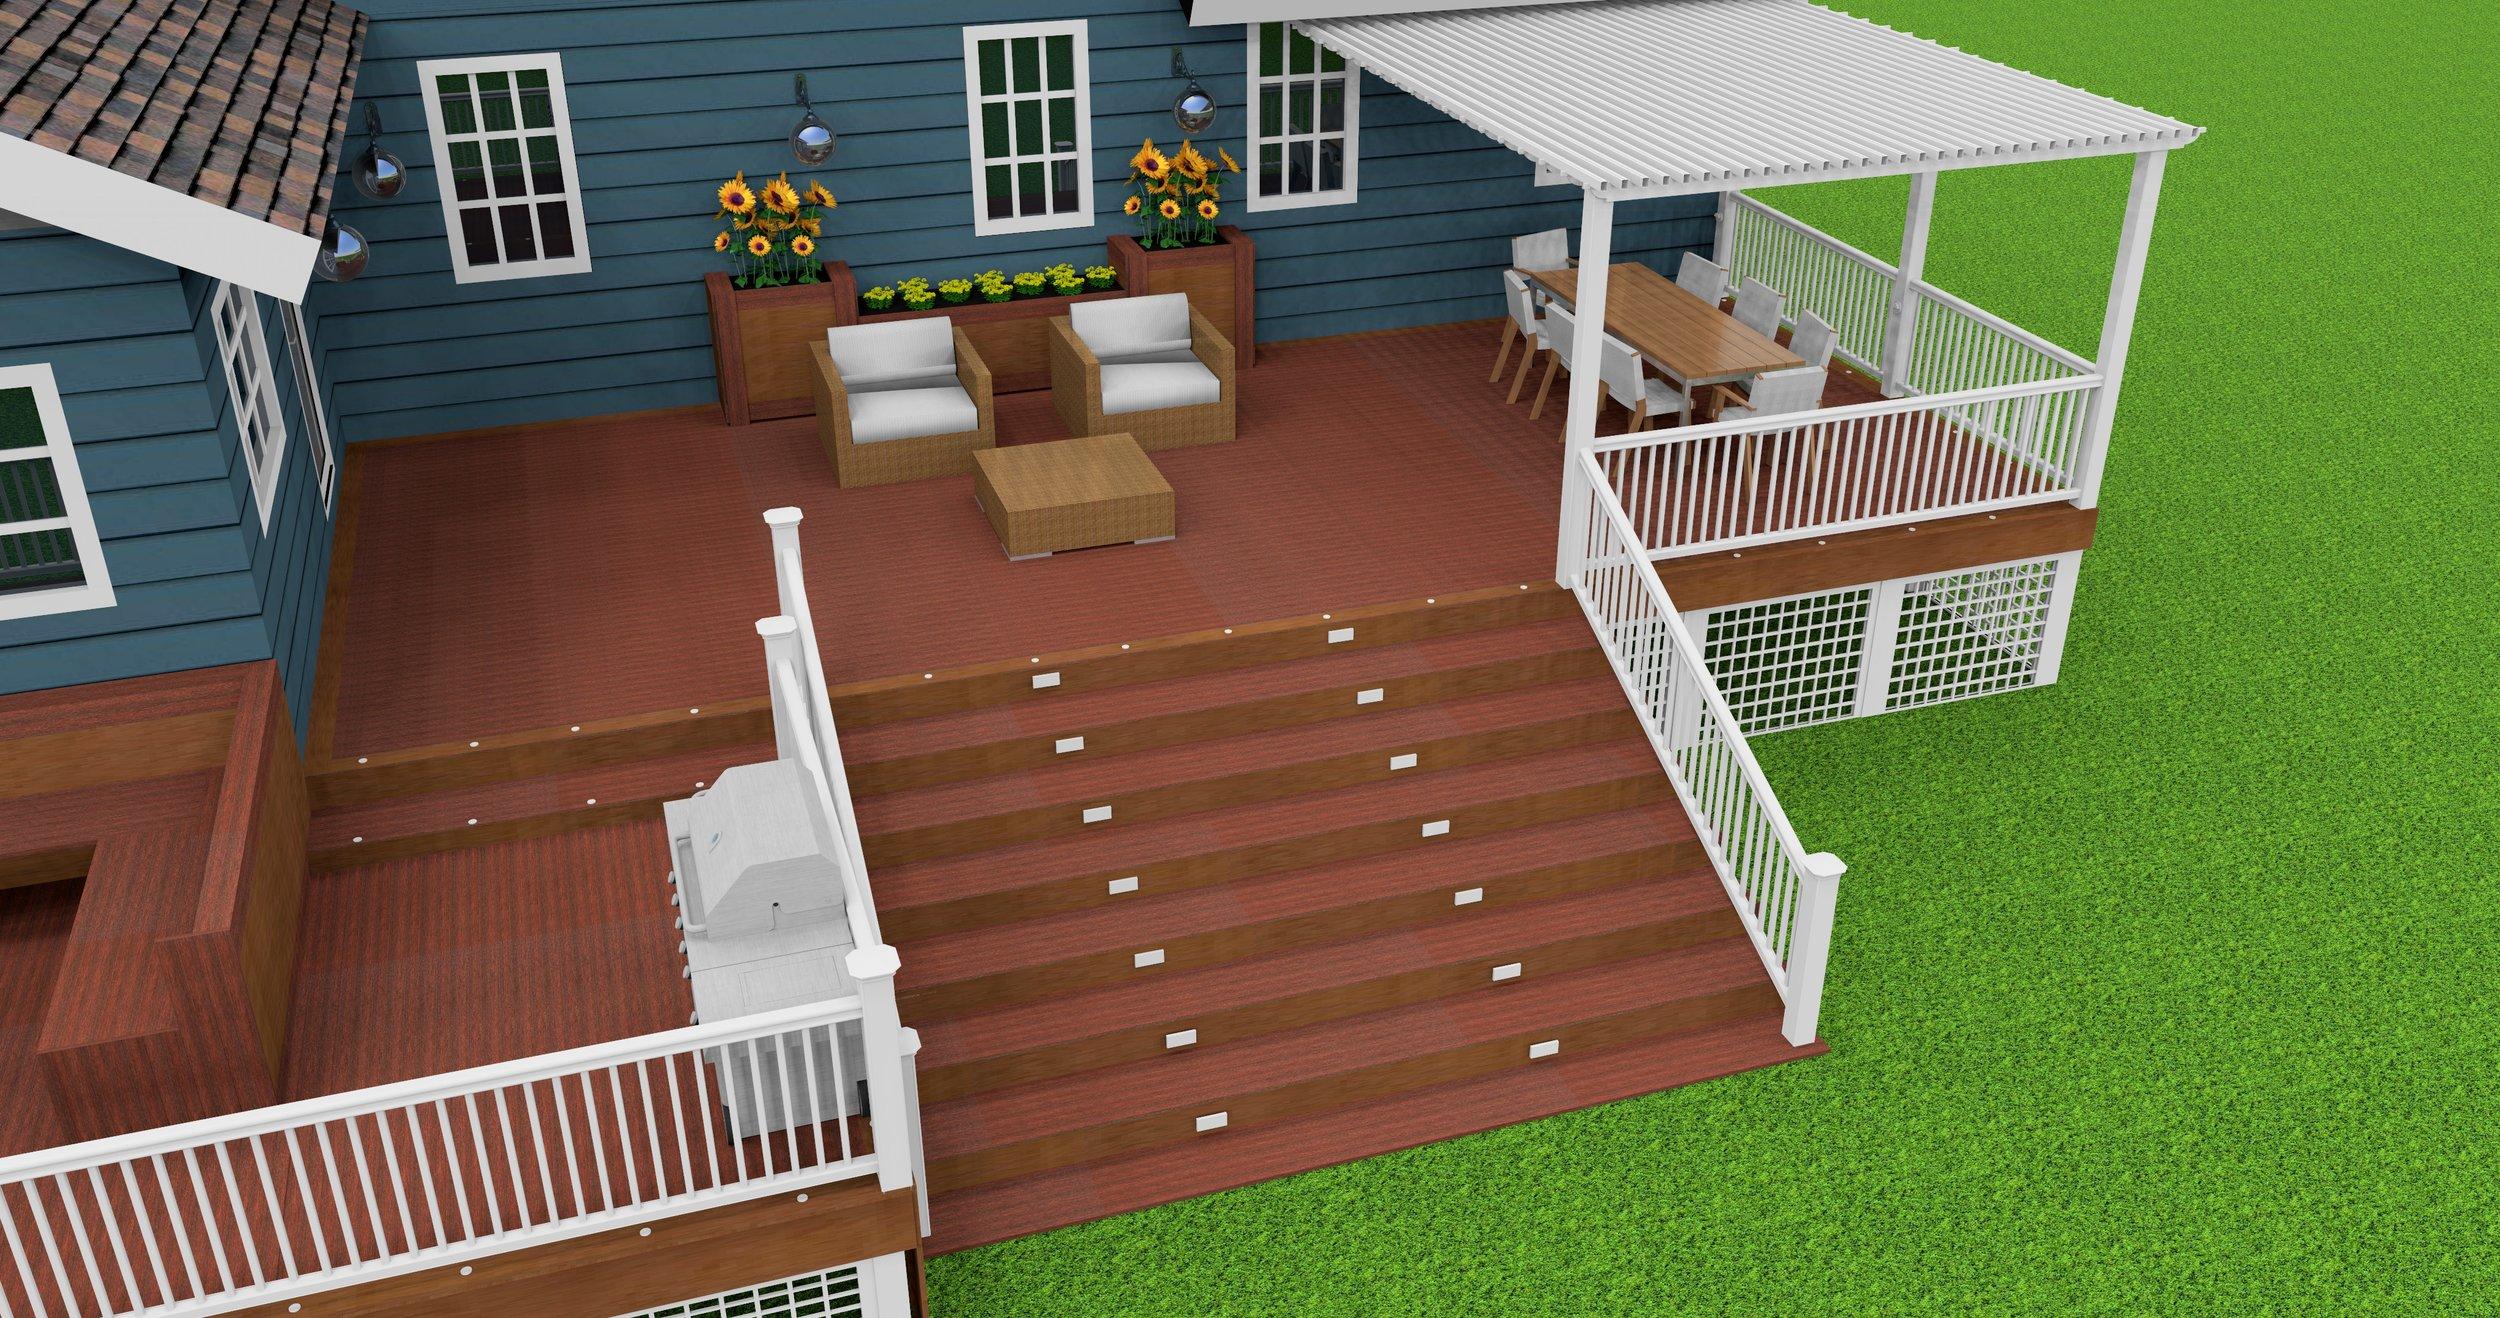 3D Design for Kentucky Project